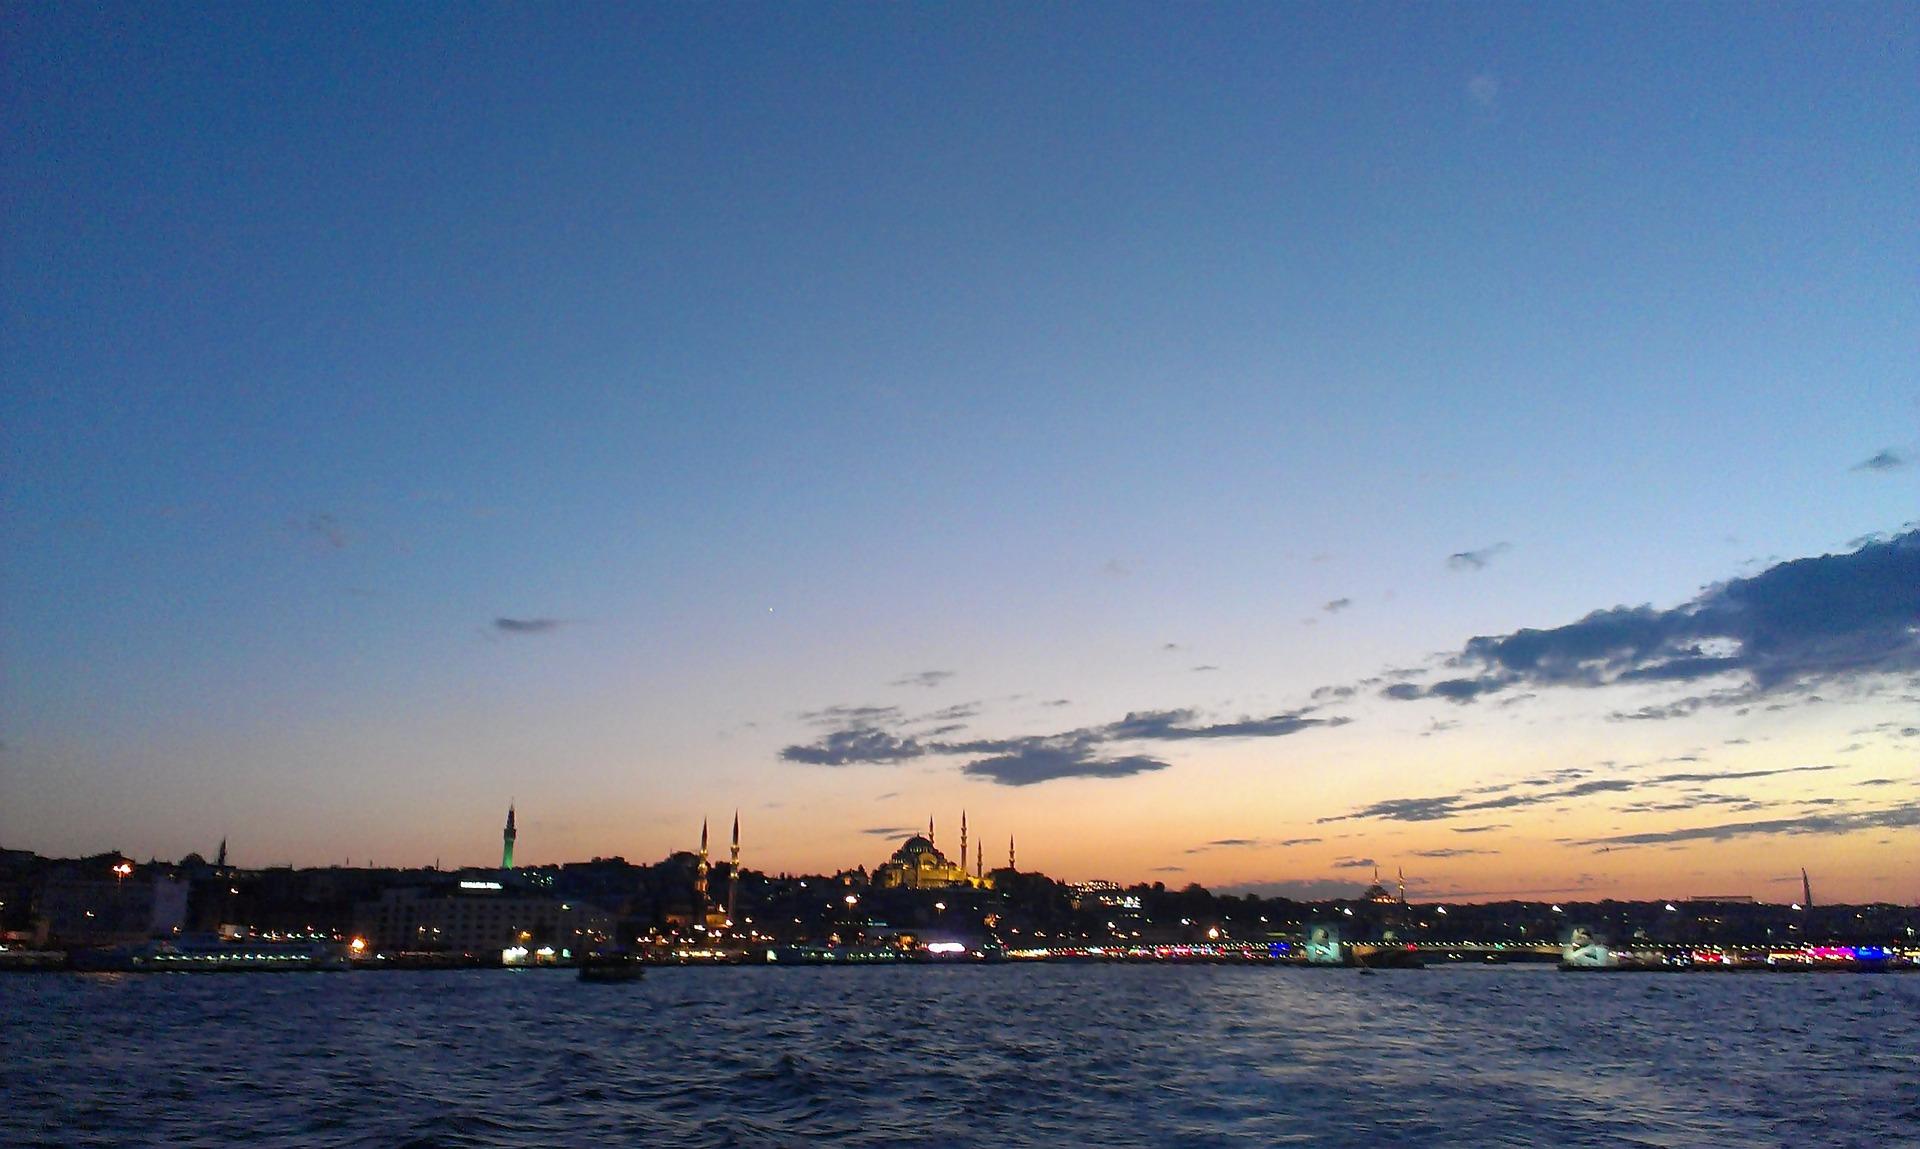 Sunset over the the Bosphorus, Istanbul, Turkey